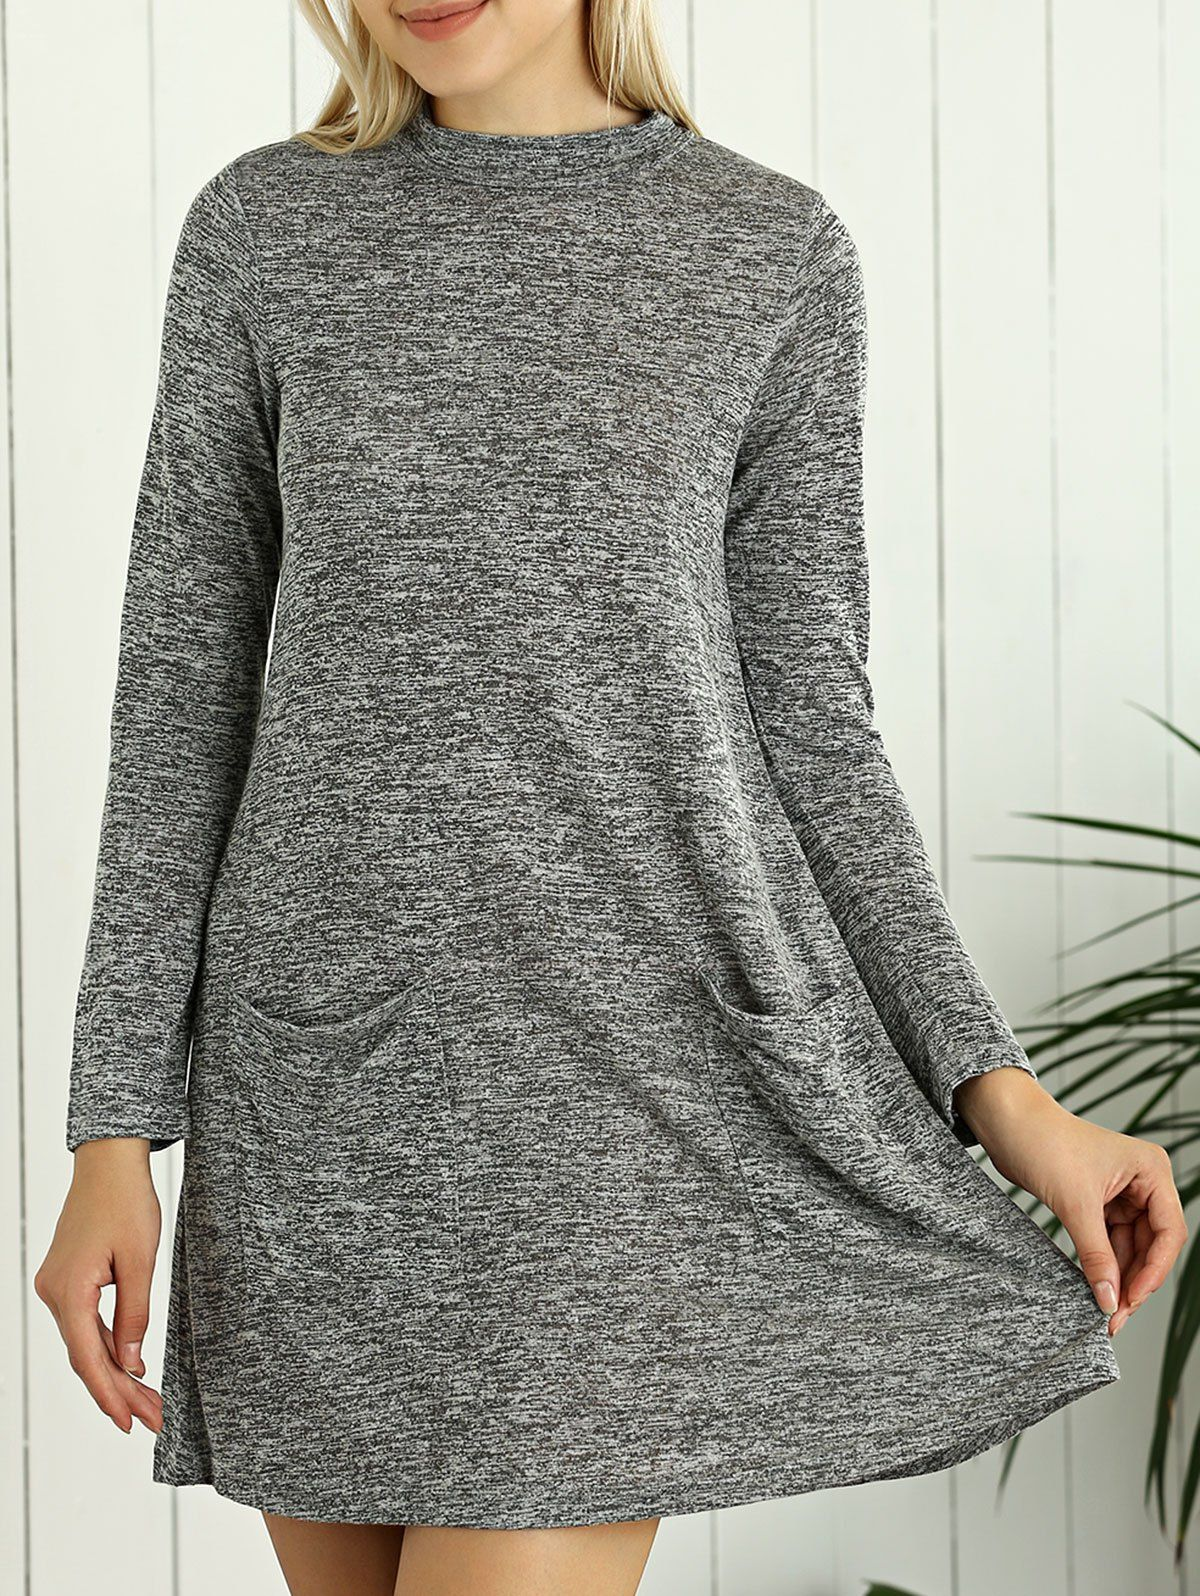 Heathered long sleeve tunic sweater dress with pocket